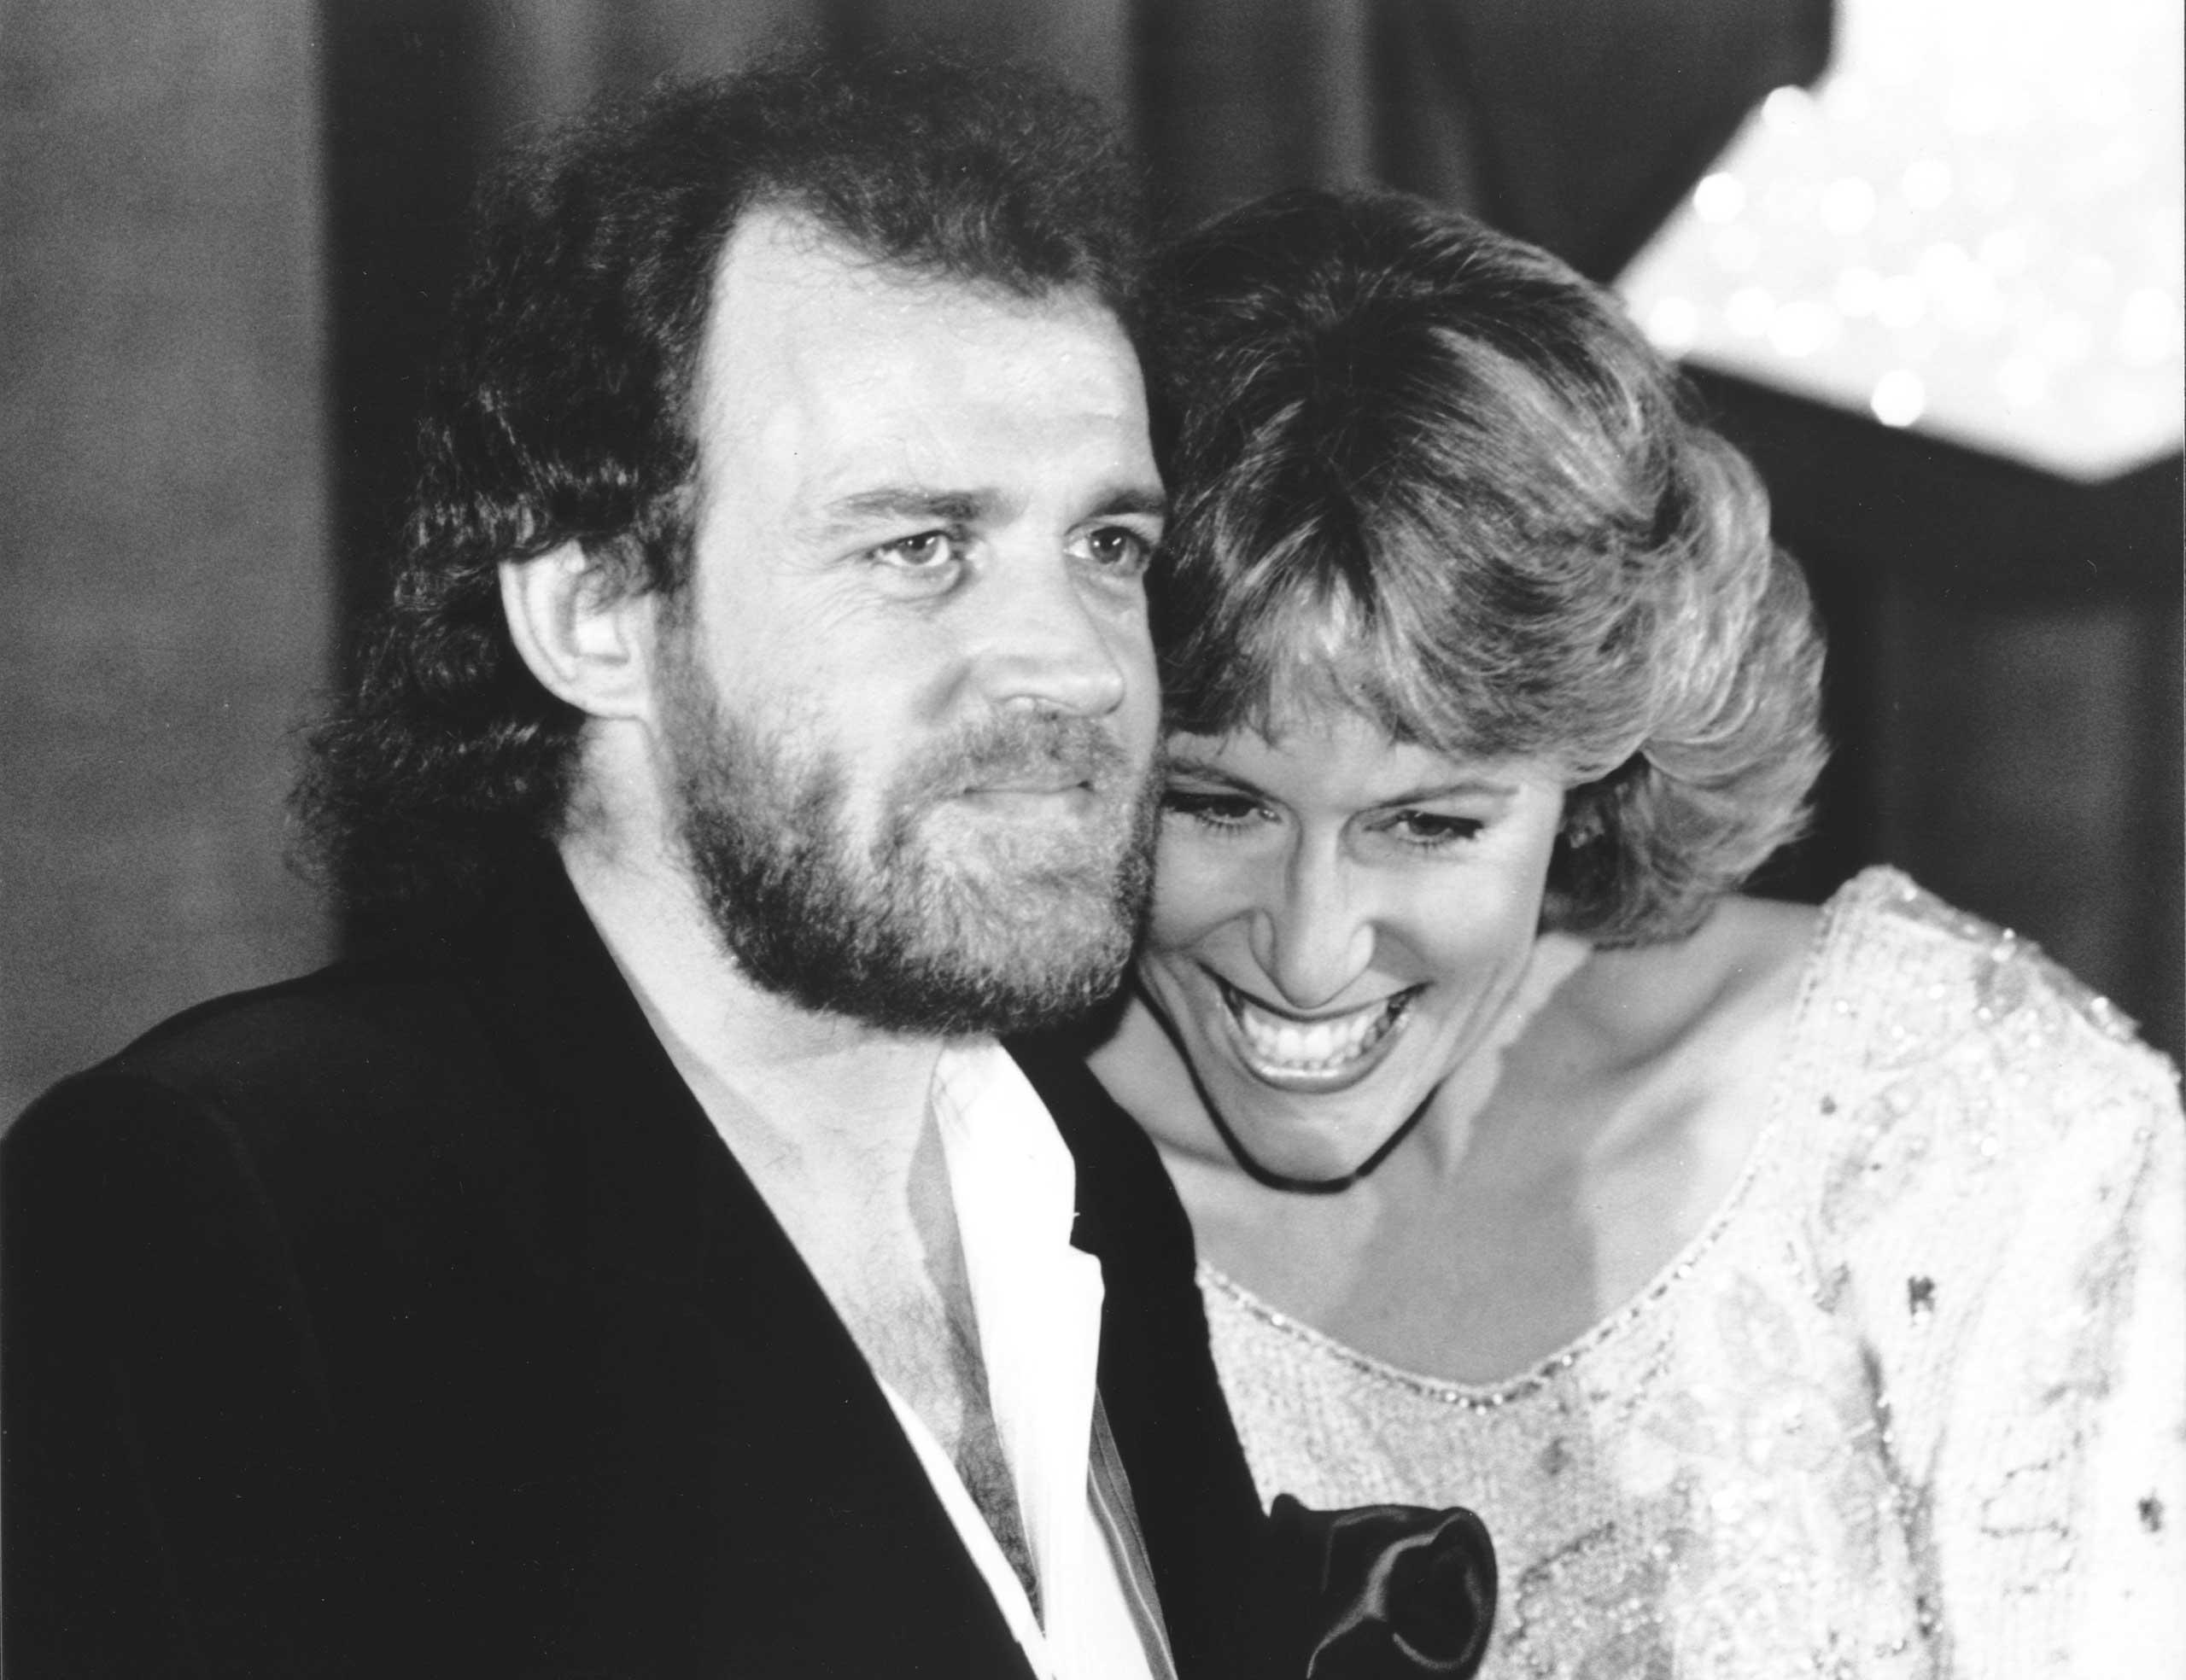 Joe Cocker and Jennifer Warnes, 1983.